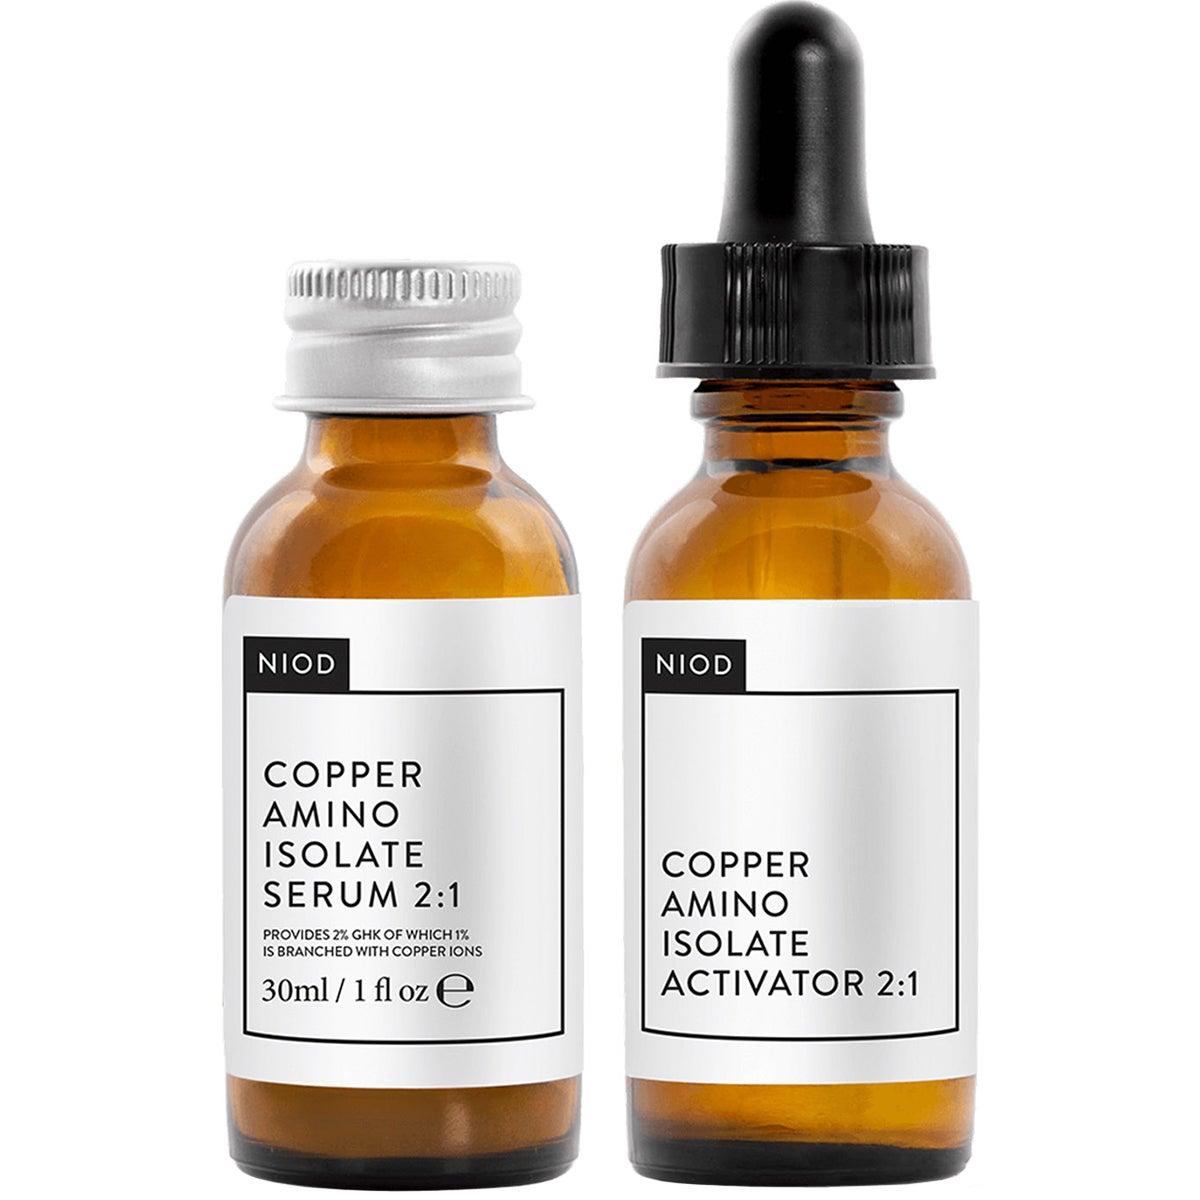 Copper Amino Isolate Serum 2:1 30 ml NIOD Serum & Olja